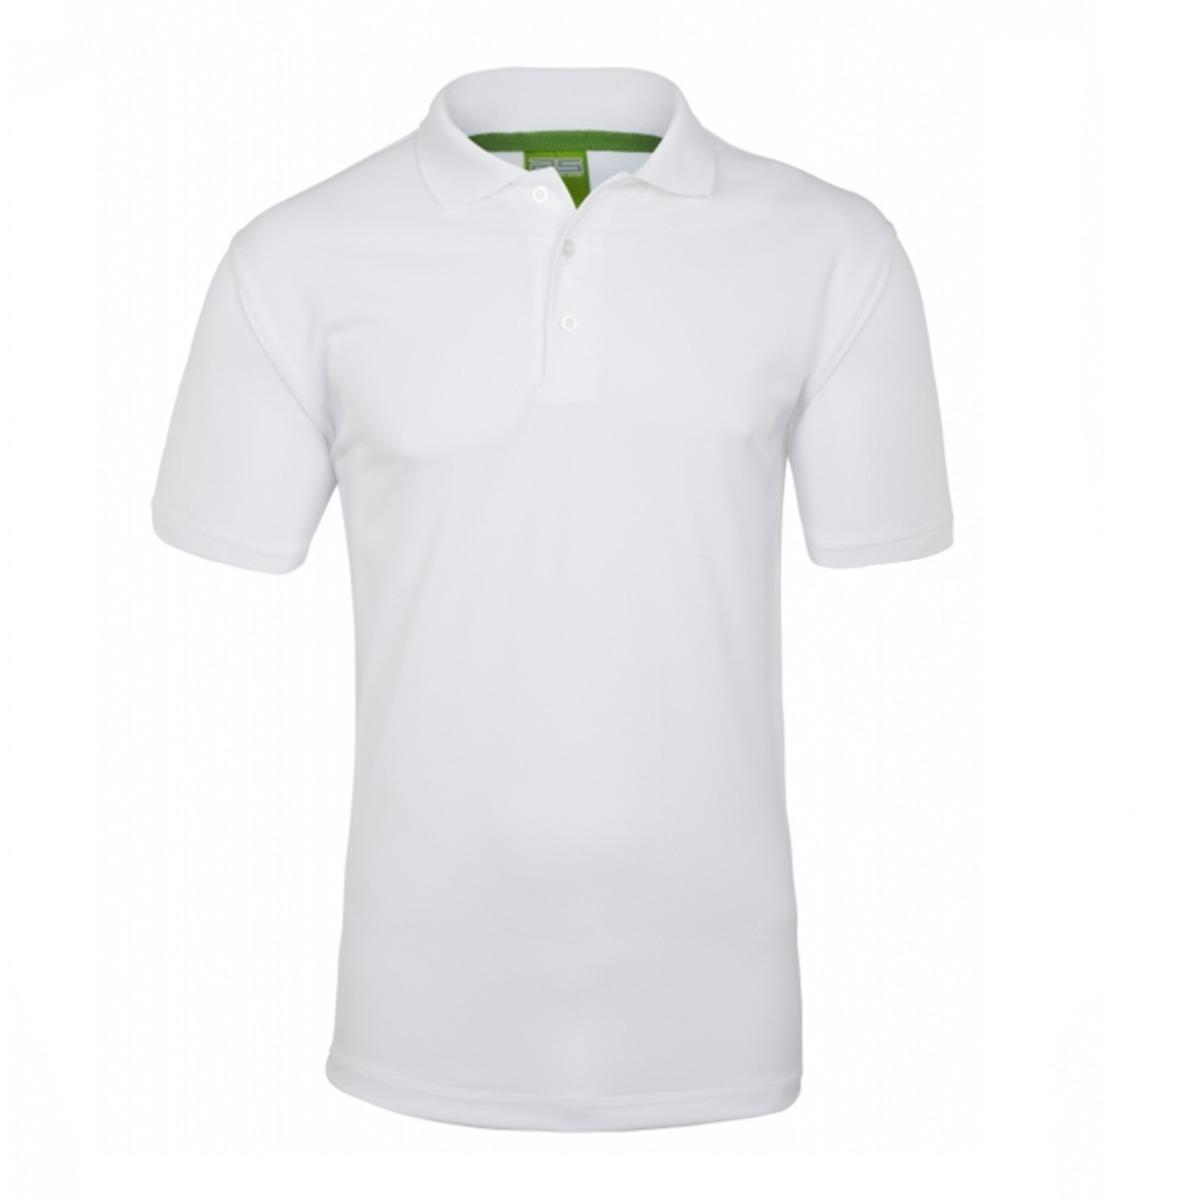 polo premium personalizada vinil textil uniforme empresa log. Cargando zoom. a970bfb748f9e